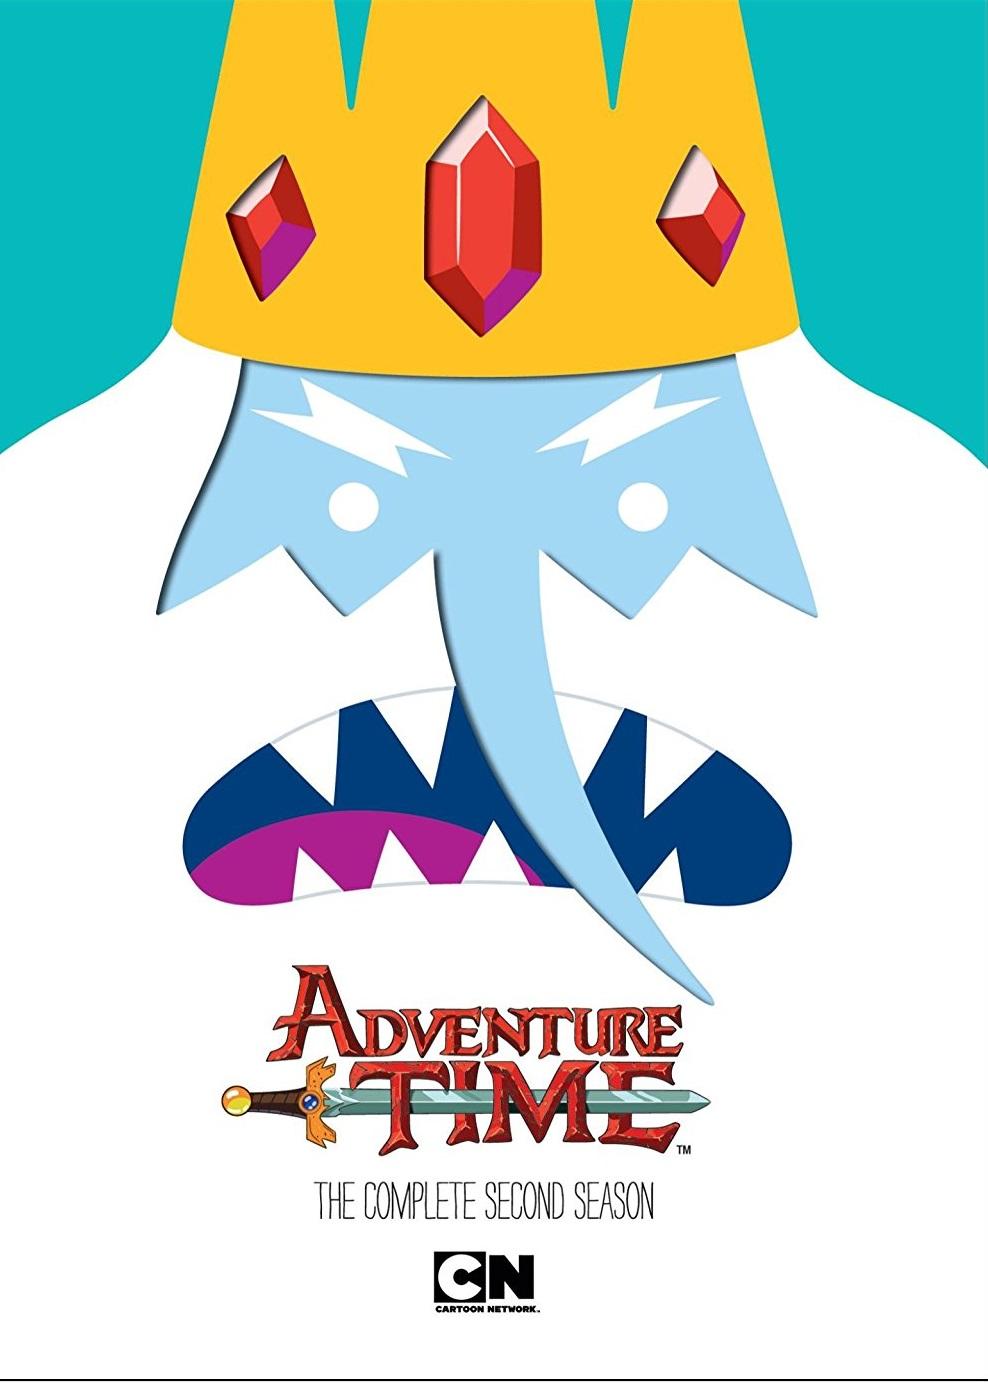 Adventure time 1080p Season 6 Guide 16 dailymotion